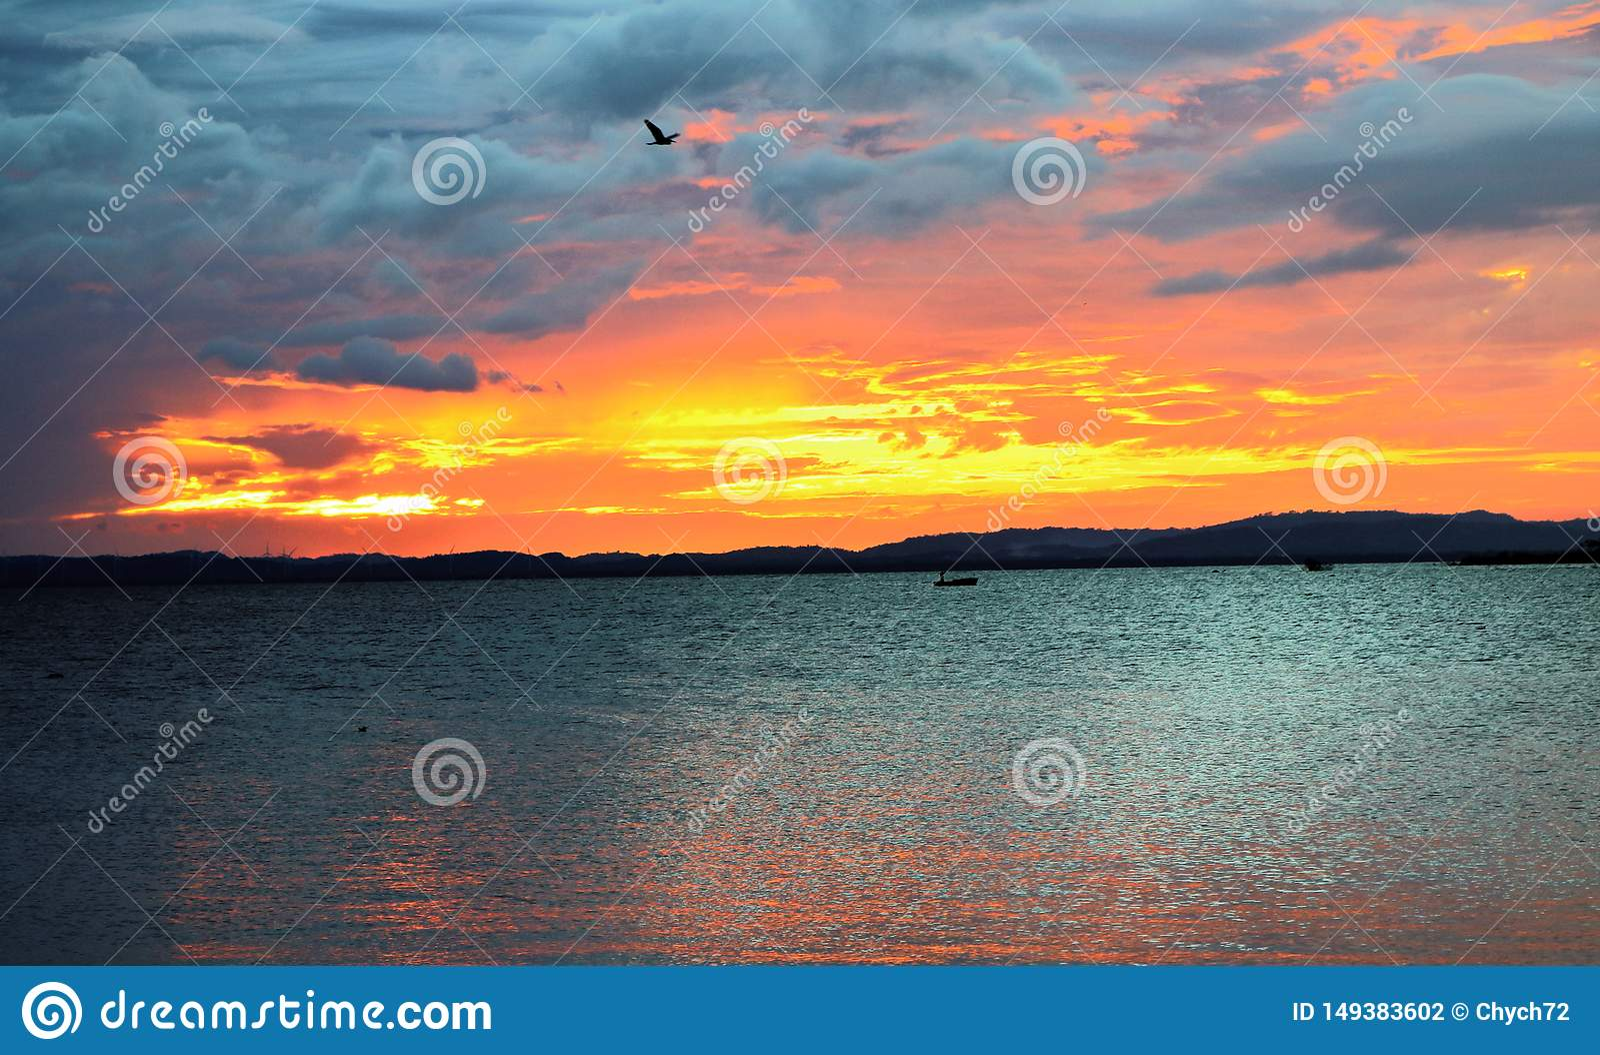 `Sky on fire`: sunset of Nicaragua Lake, Ometepe Island, Nicaragua